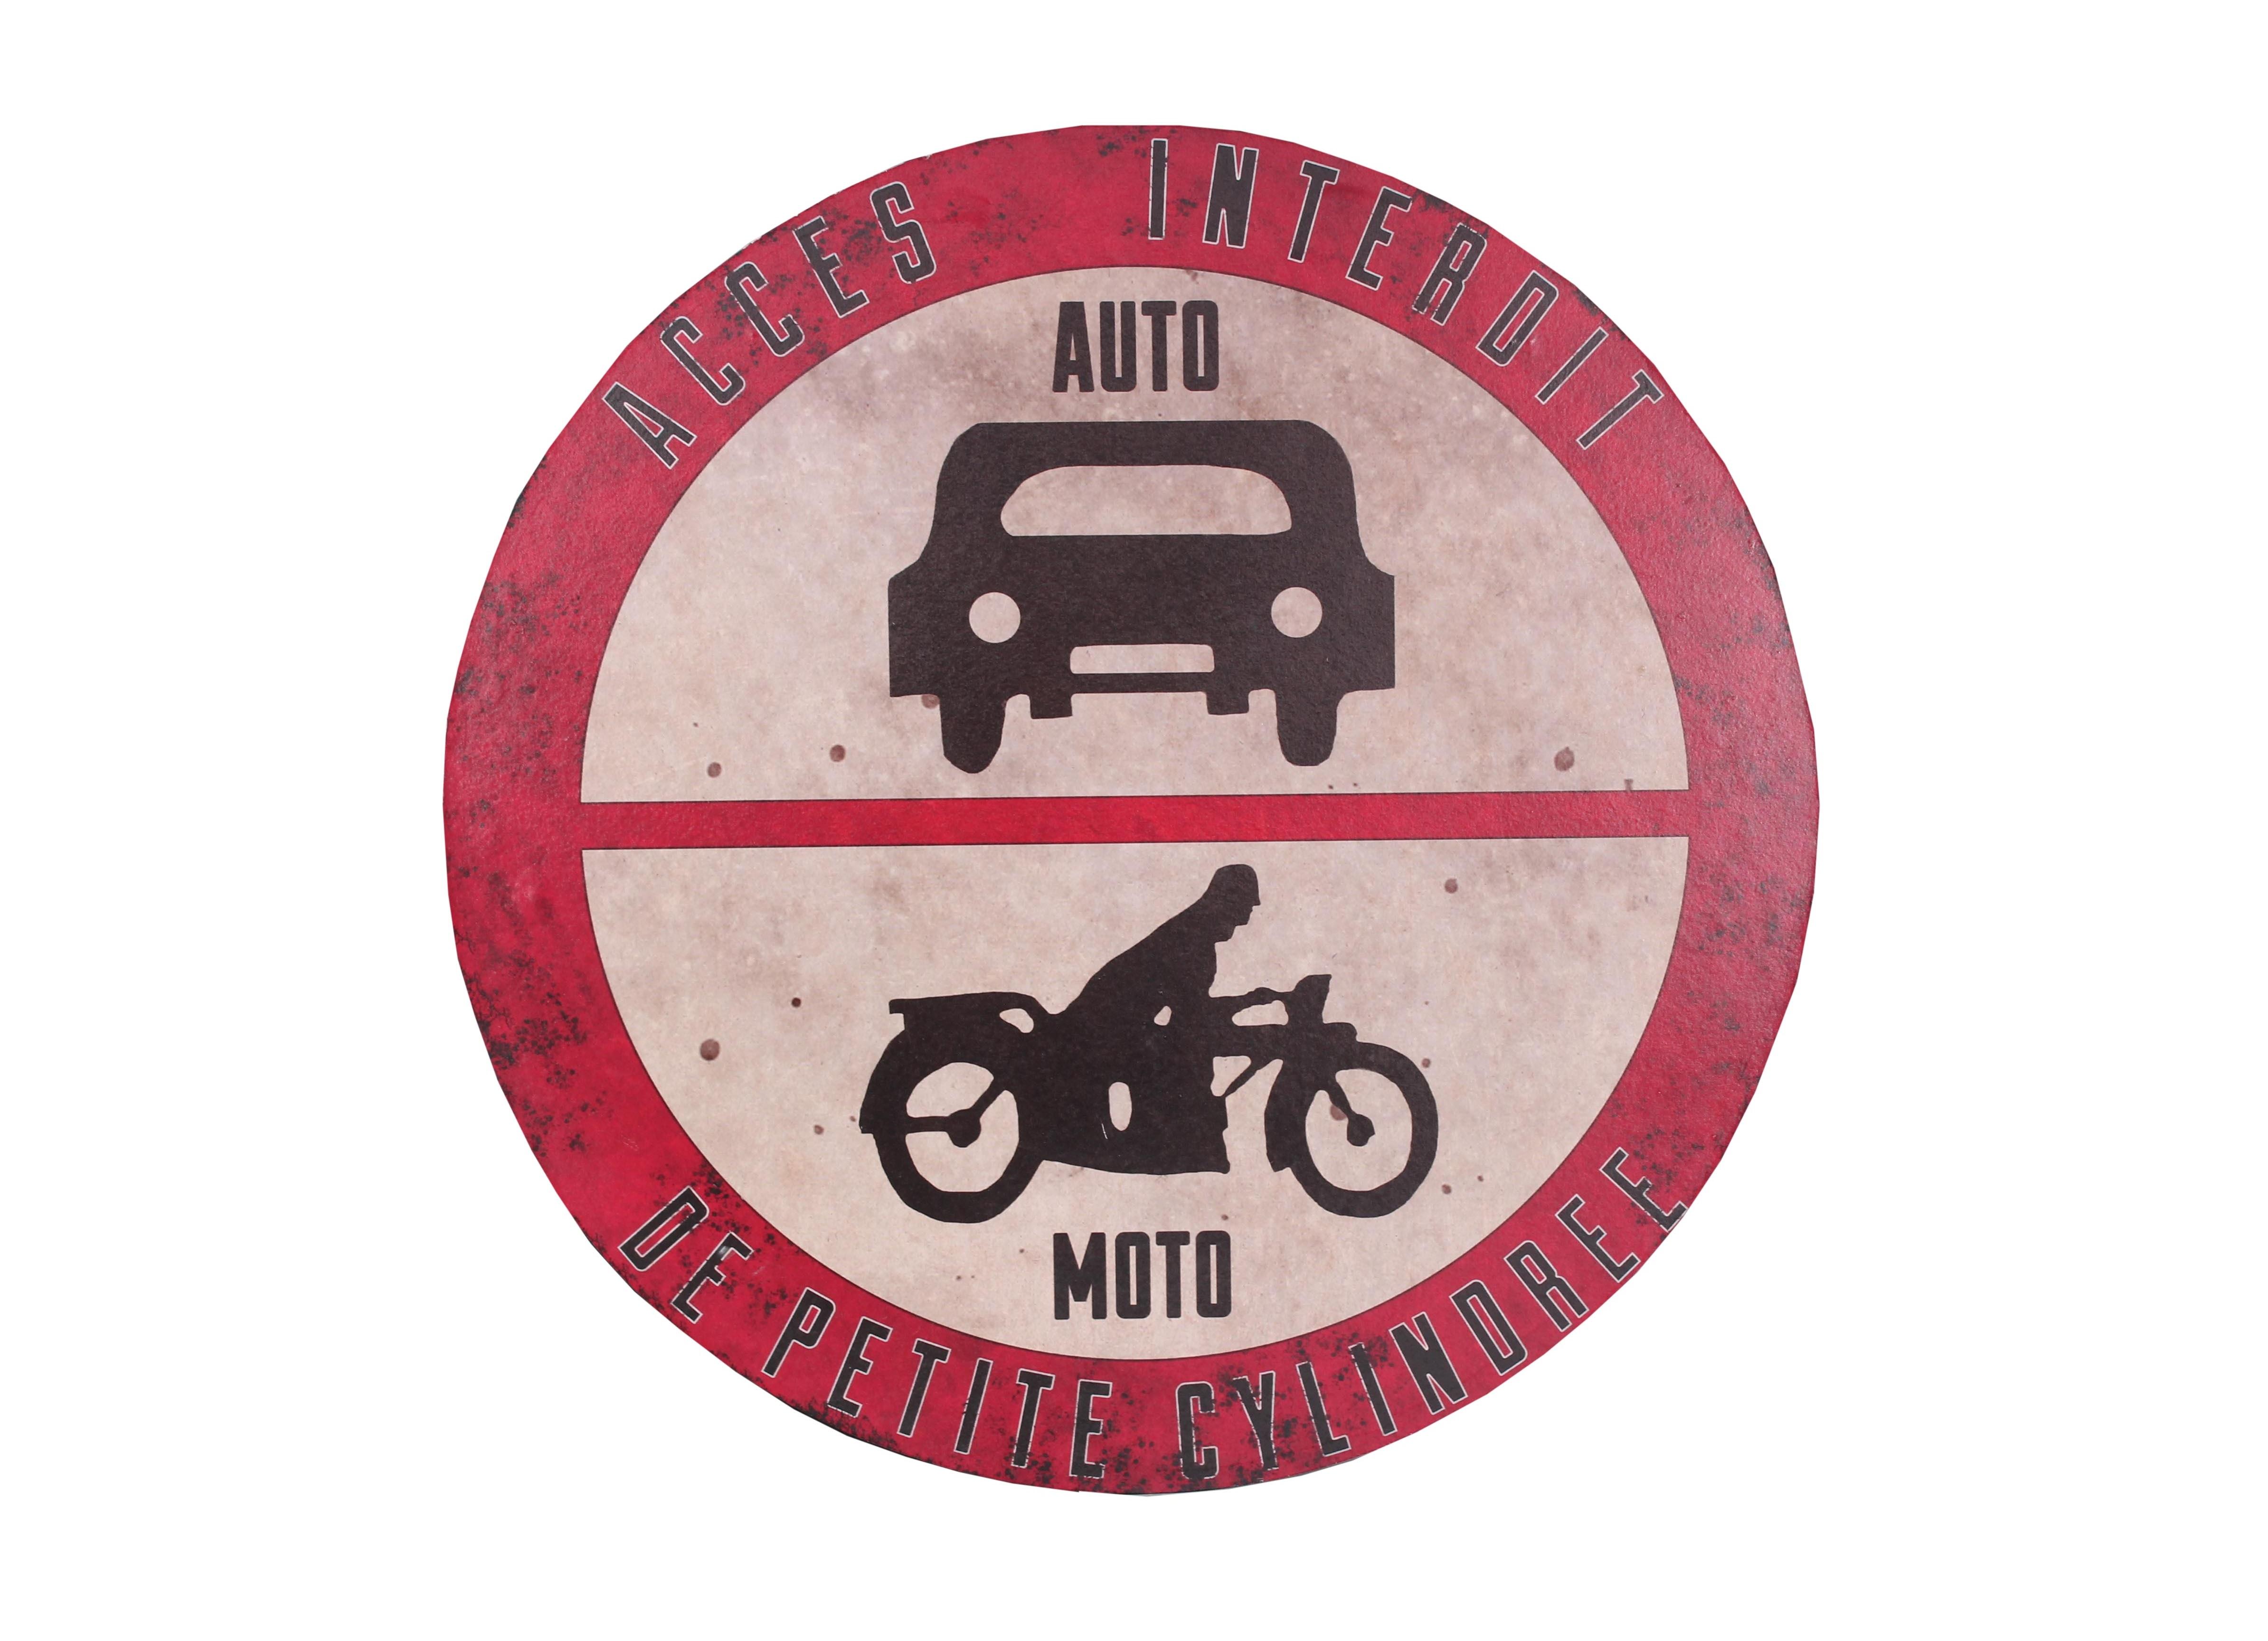 Декоративная табличка Auto-MotoДругое<br>Материал: Железо, бумага<br><br>Material: Железо<br>Length см: None<br>Width см: None<br>Depth см: 0.33<br>Height см: None<br>Diameter см: 44